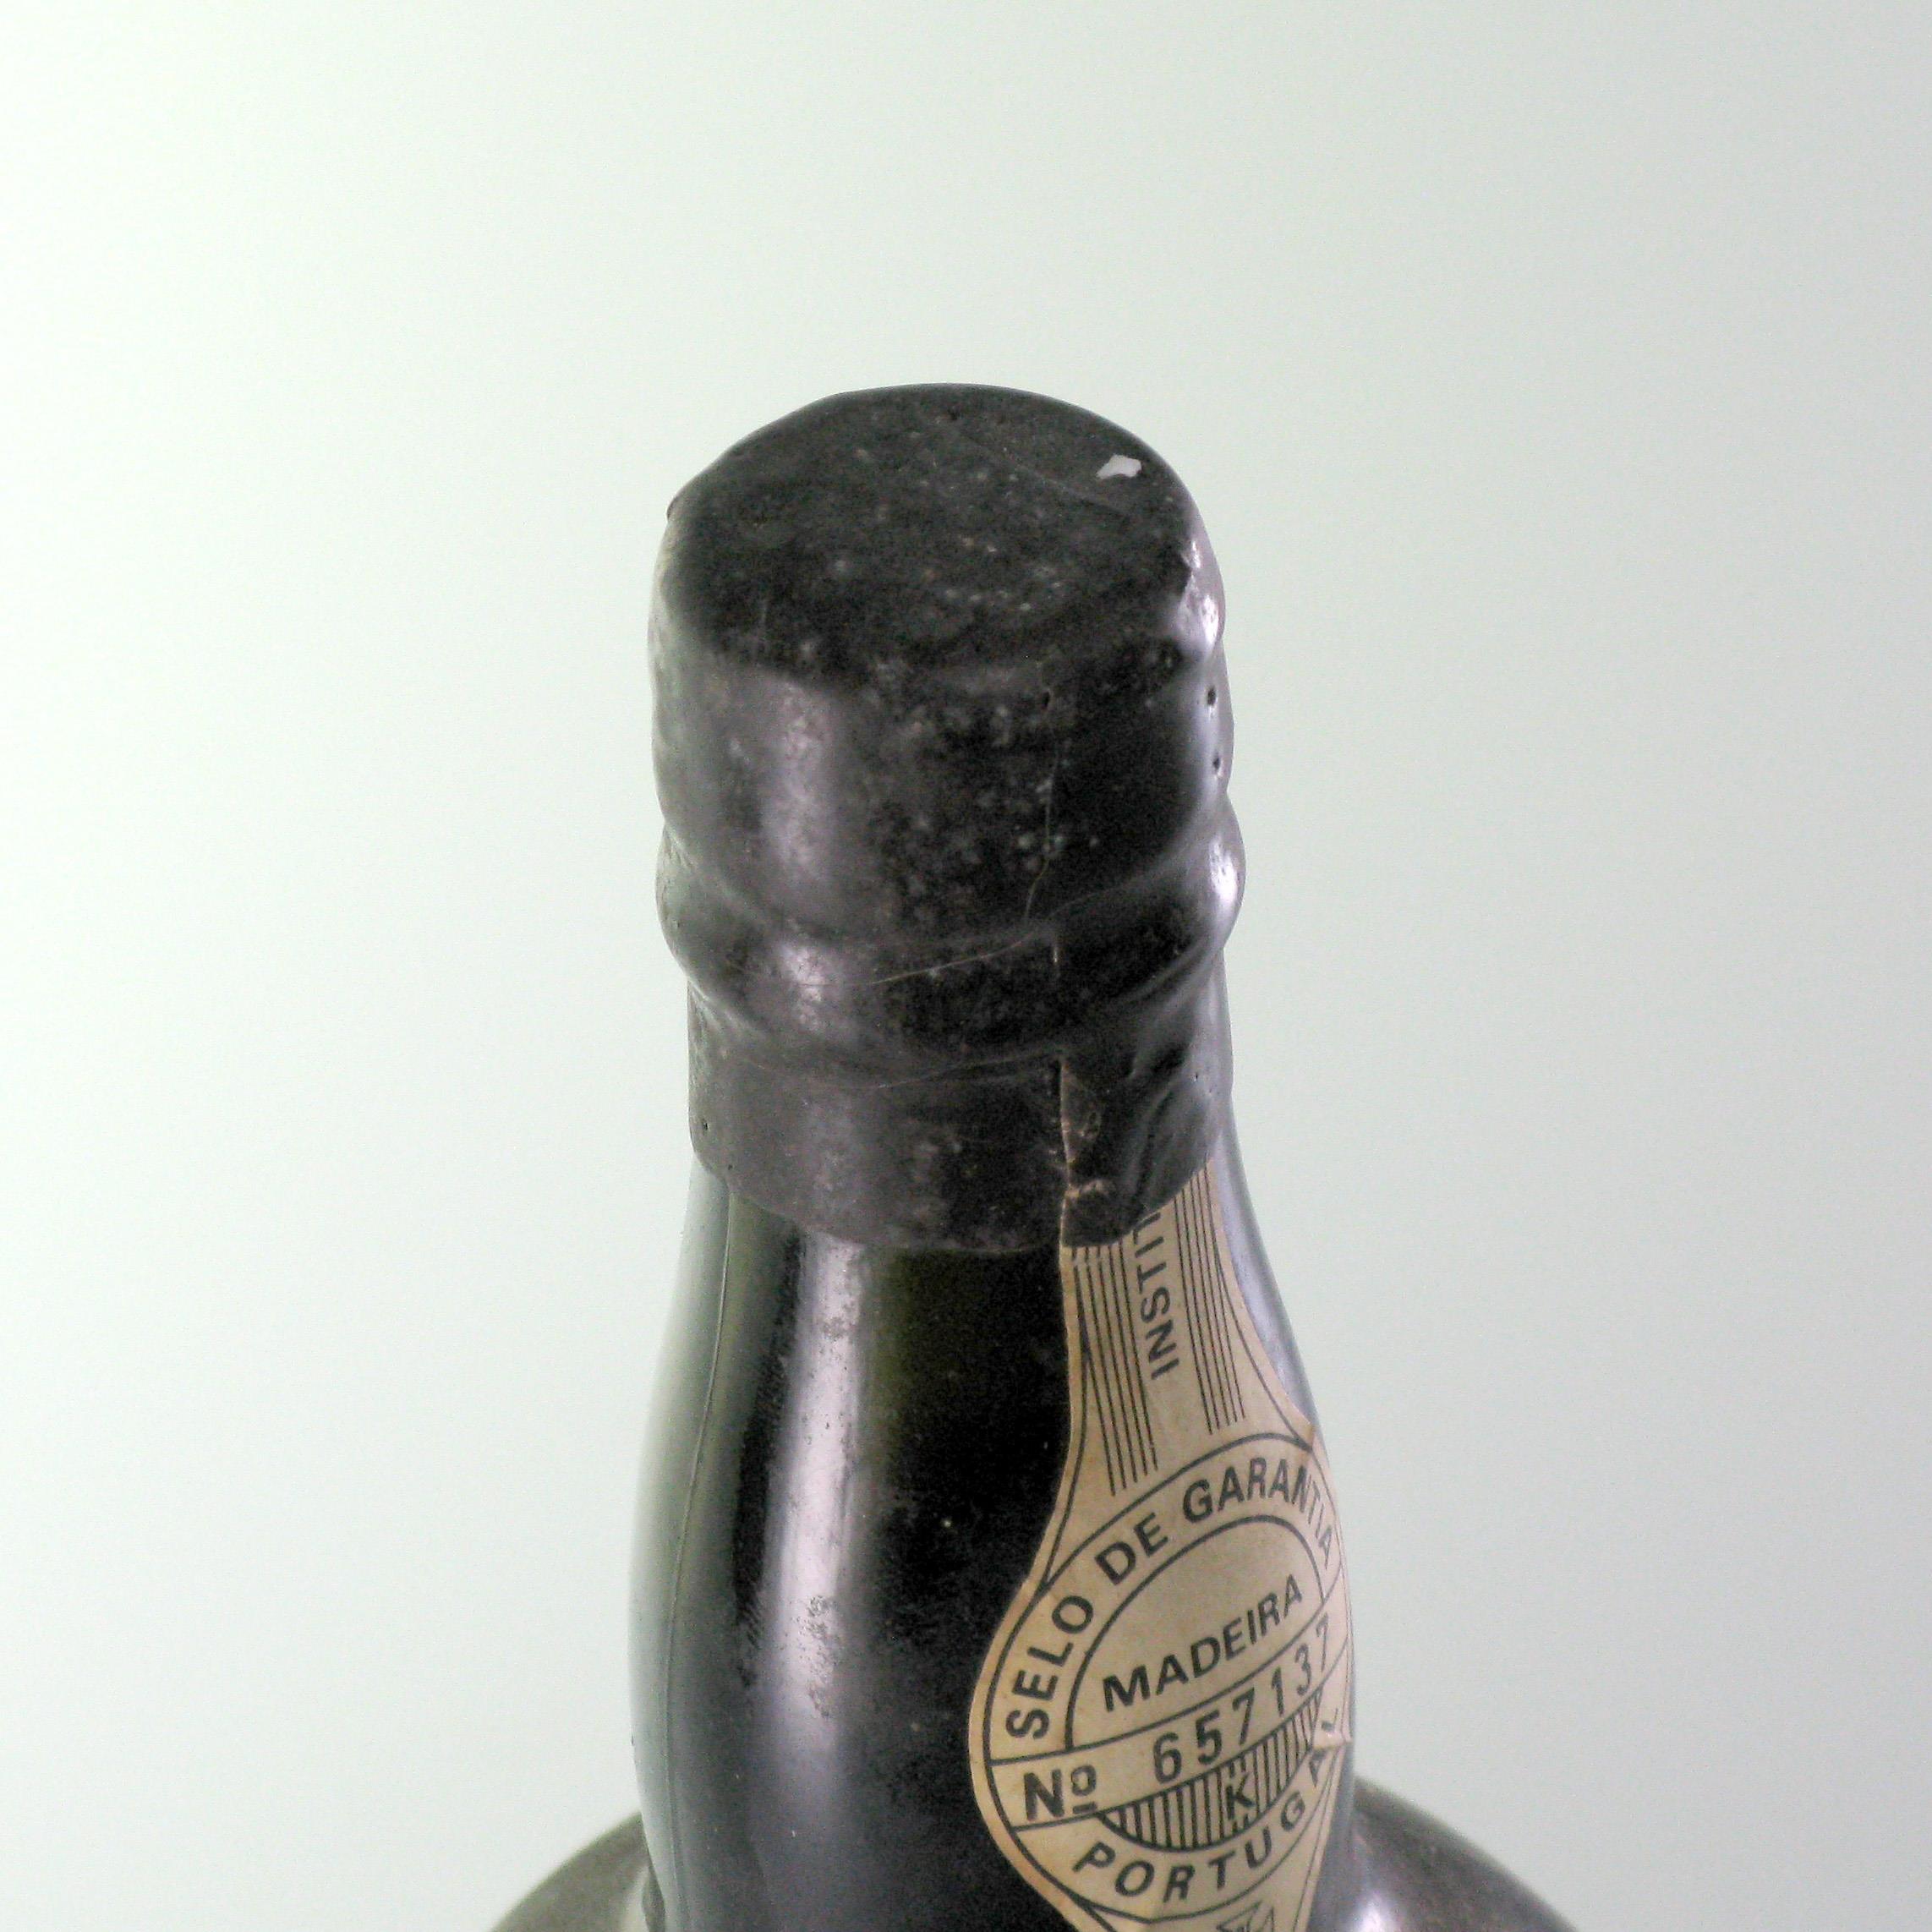 Madeira 1862 D'Oliveiras